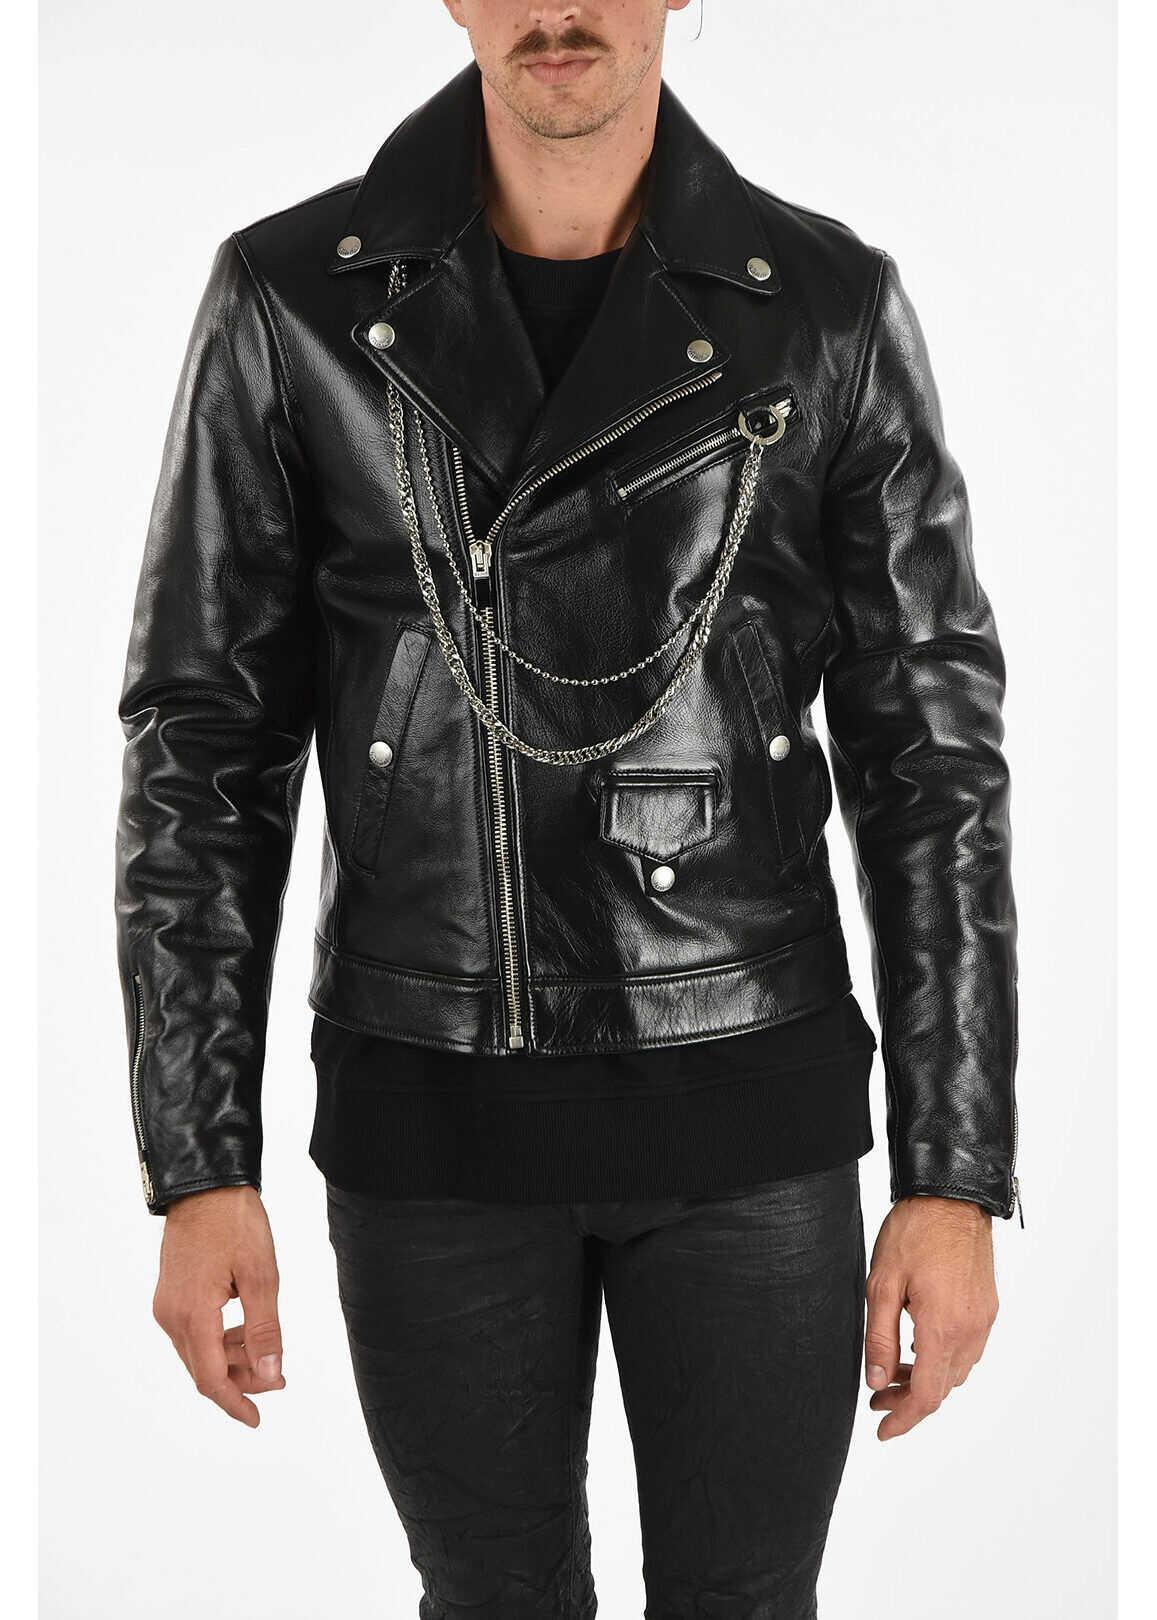 Just Cavalli Leather Biker Jacket with Chain BLACK imagine